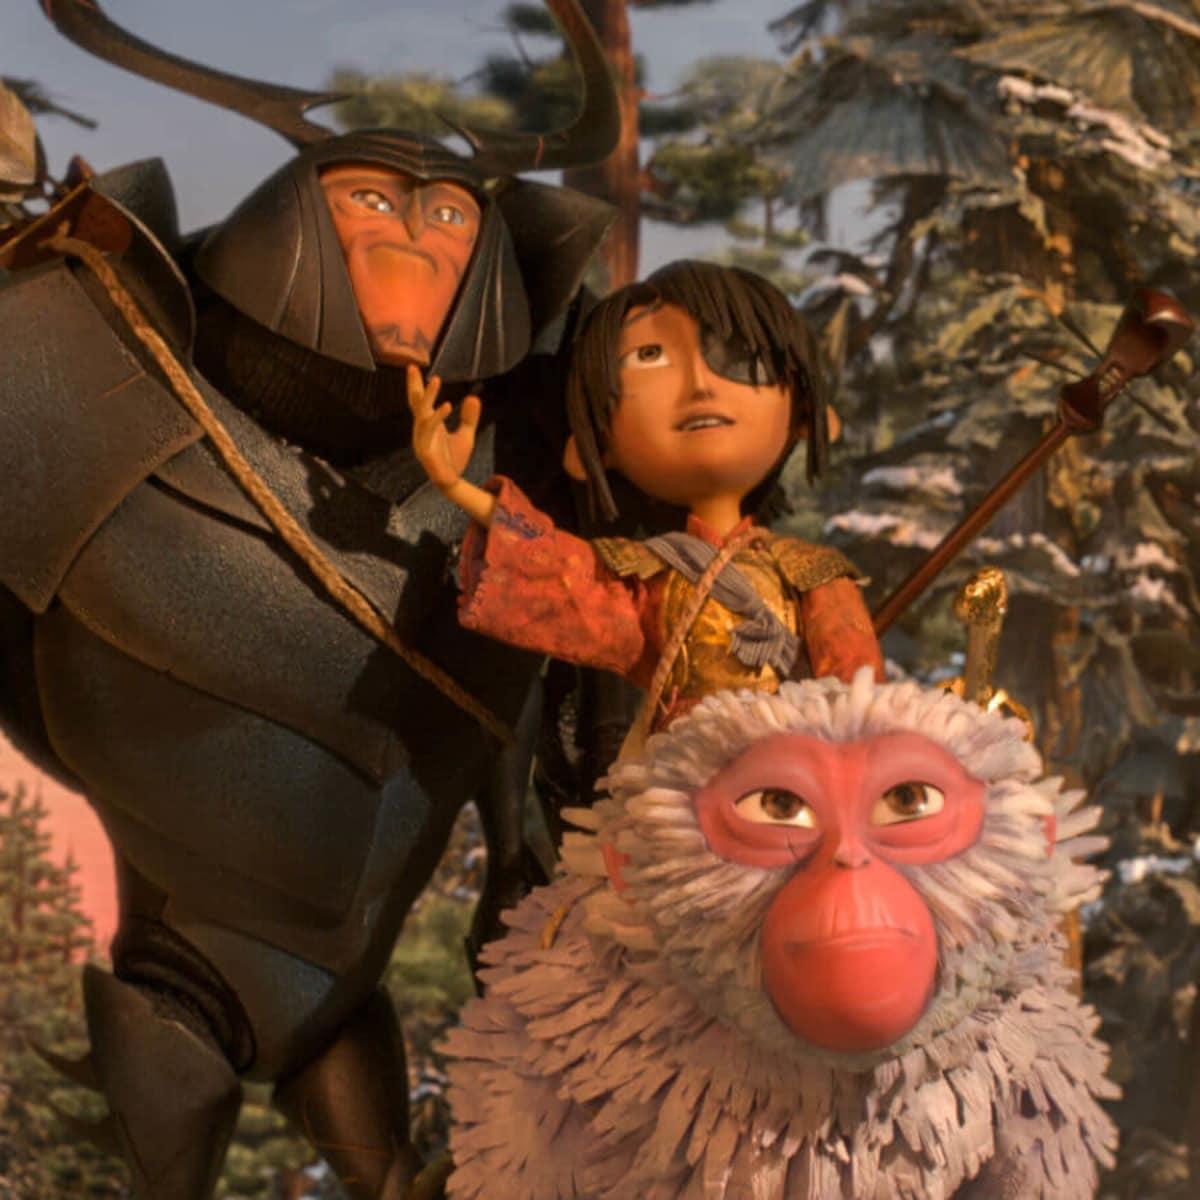 Beetle, Kubo, and Monkey in Kubo & the Two Strings